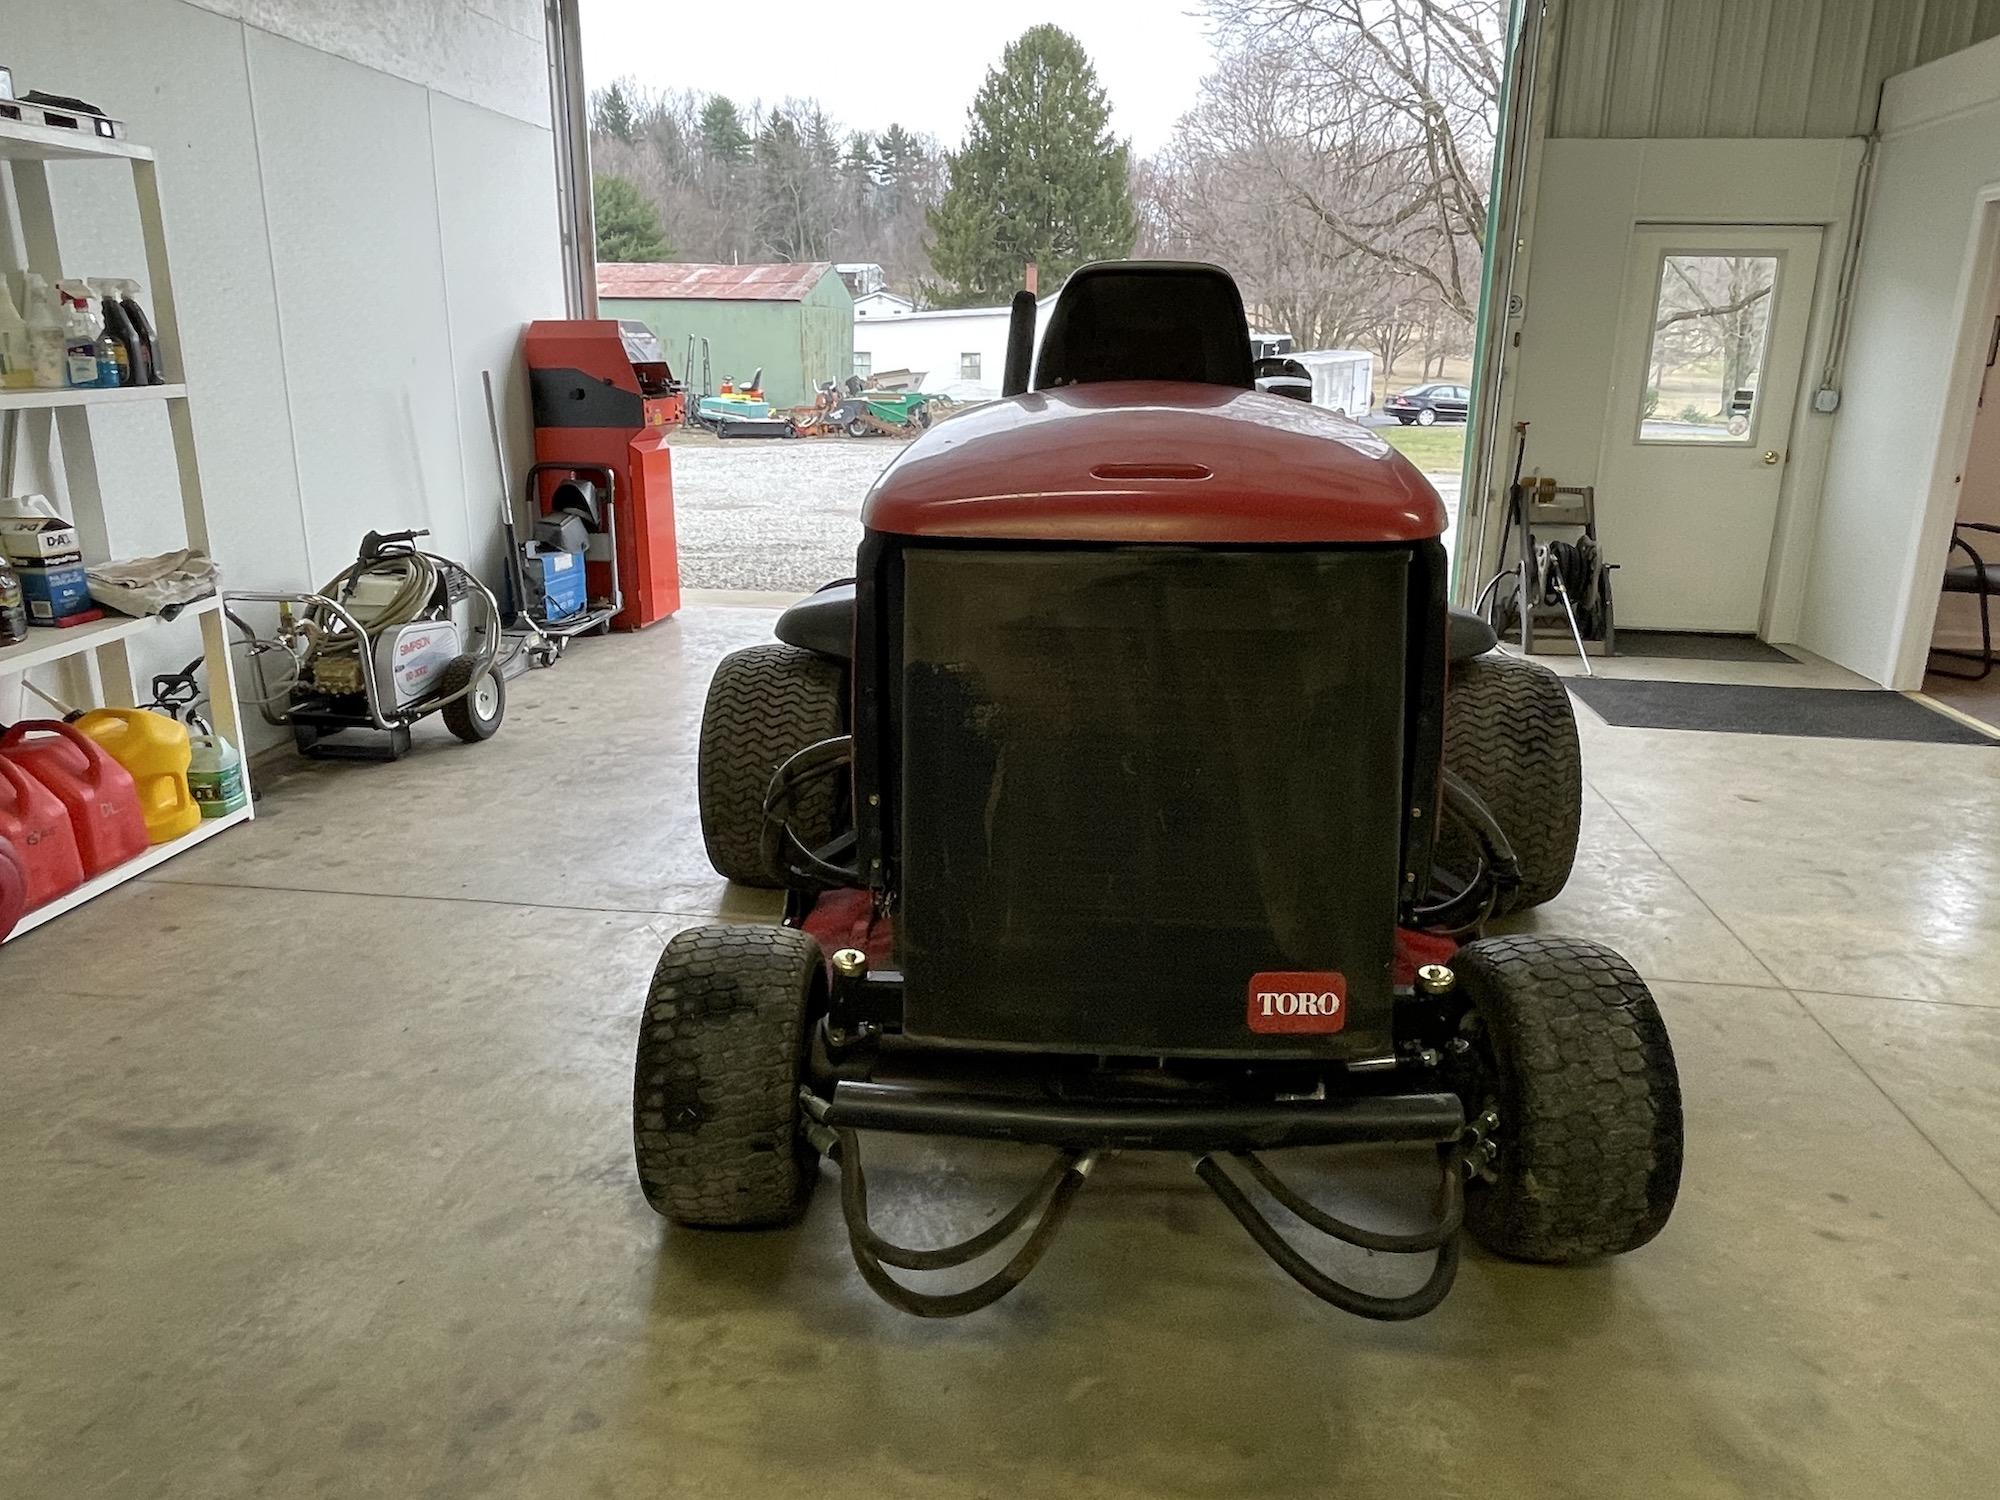 Toro-4300D-Rough-Mower-03